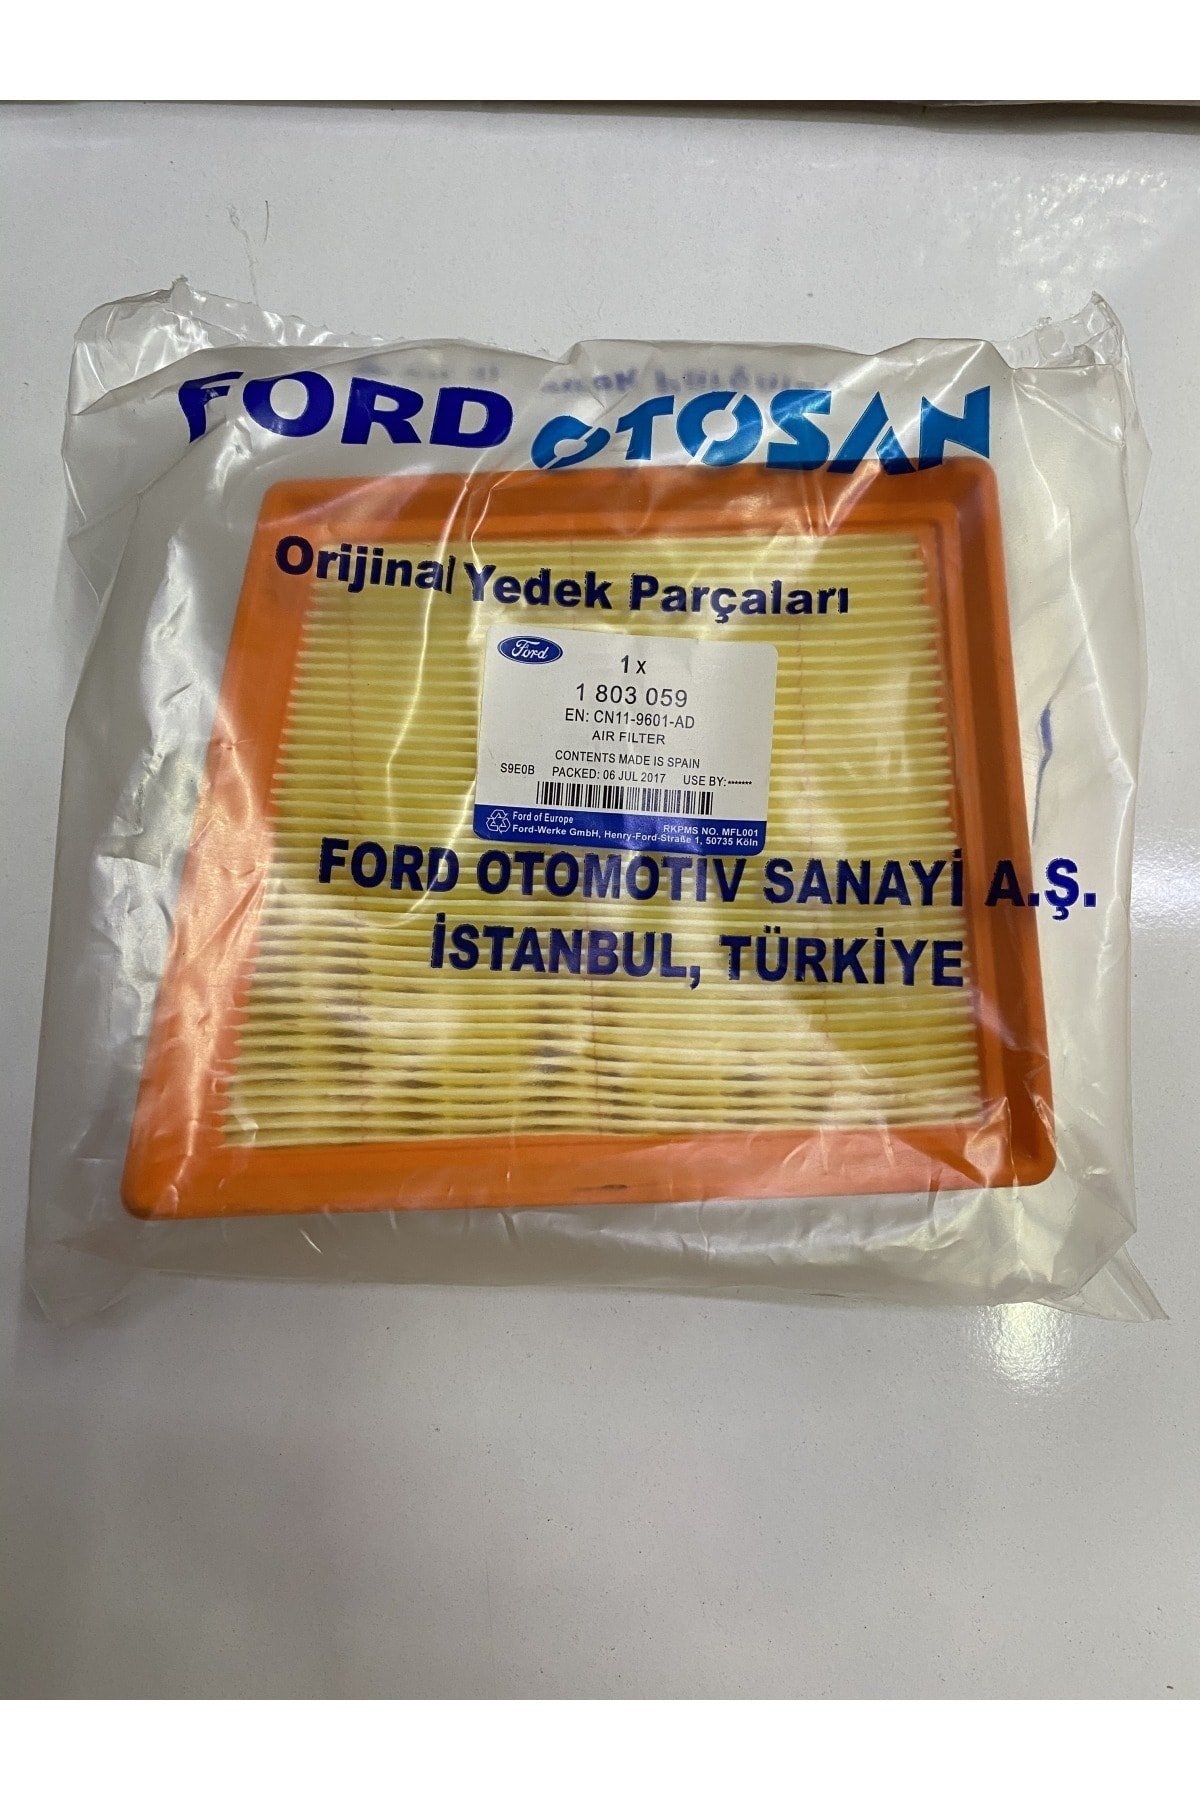 FOMOCO Ford Courier 1.5-1.6 Tdci Hava Filtresi Orijinal Ürünüdür. 2